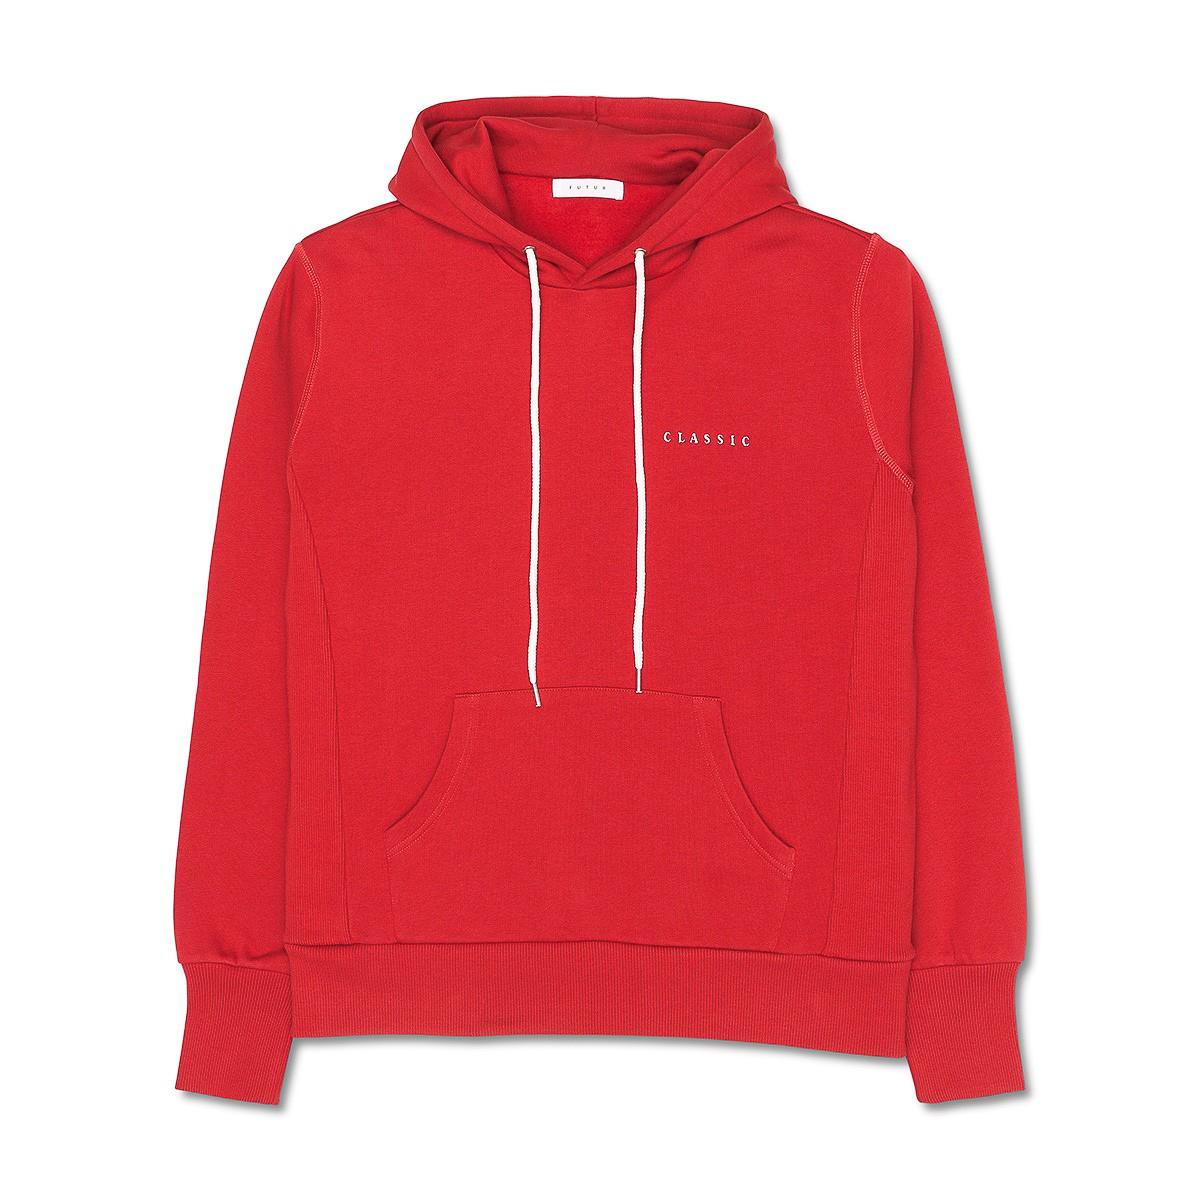 51e02b923 Lyst - Futur Classic Hooded Sweatshirt in Red